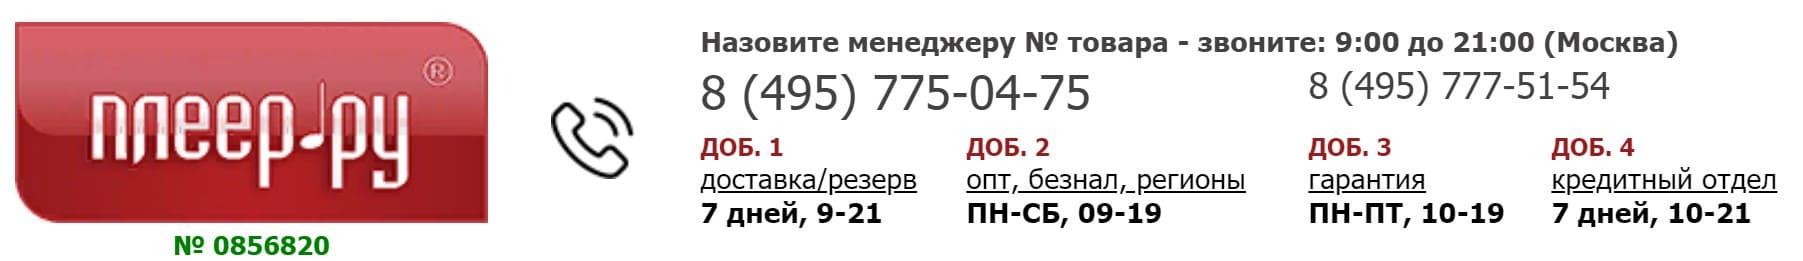 Плеер Ру сайт интернет магазина